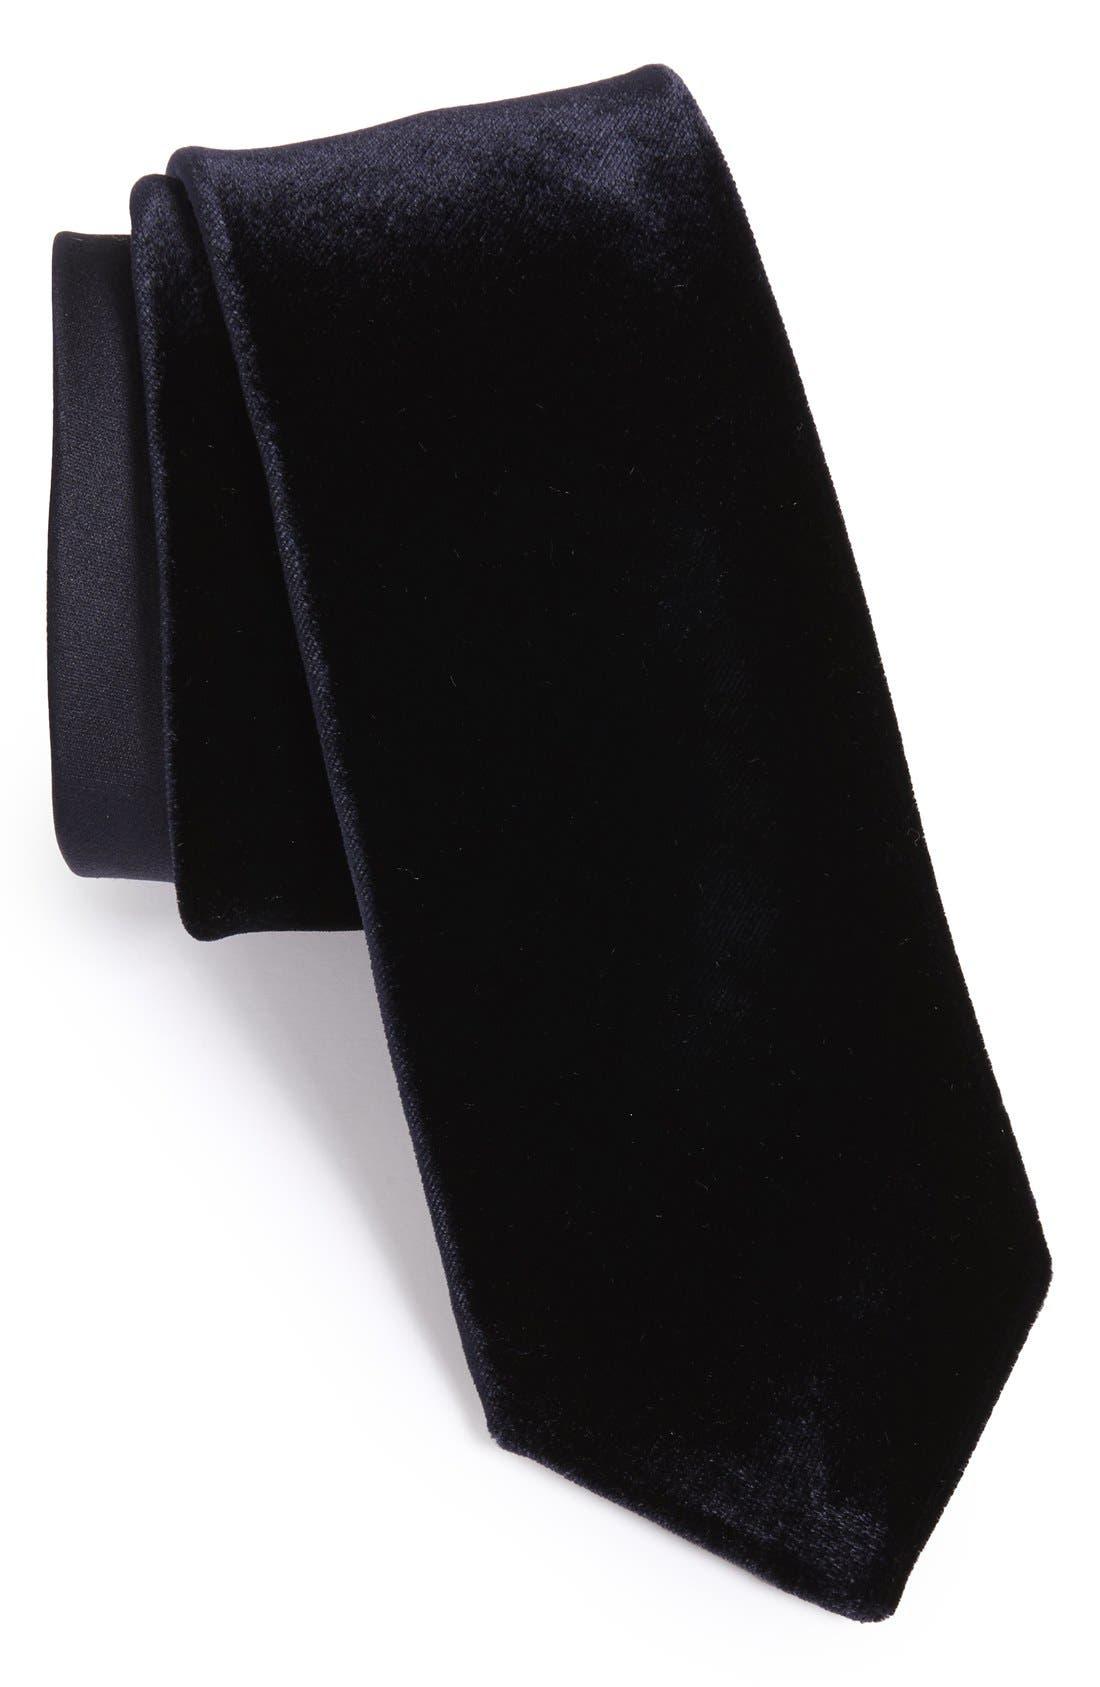 Alternate Image 1 Selected - Yves Saint Laurent Woven Tie